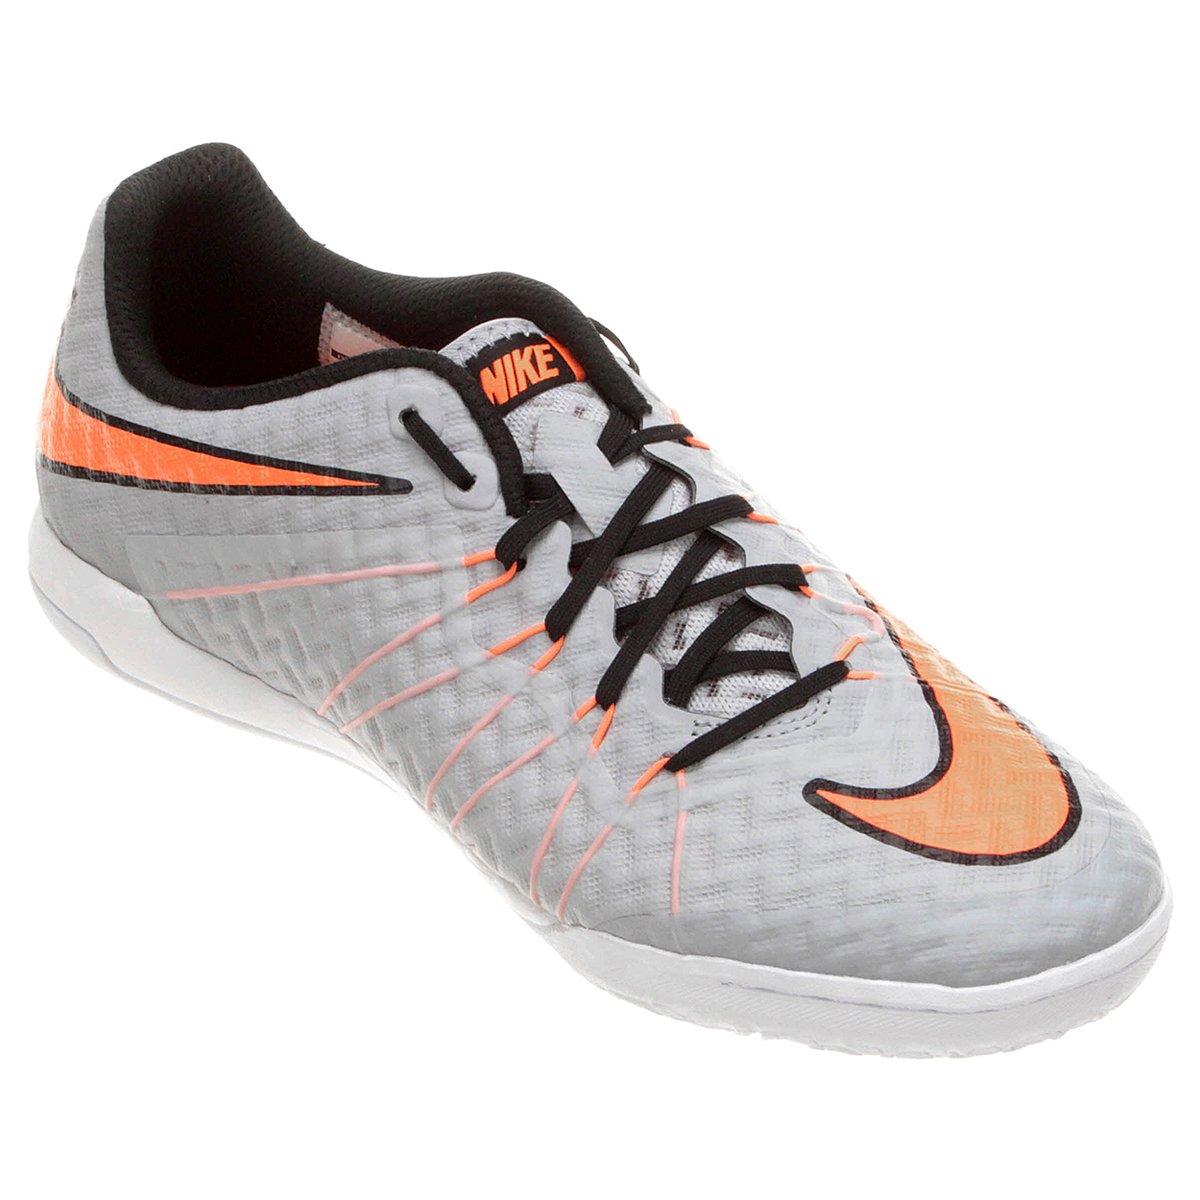 Chuteira Nike Hypervenom Finale IC - Compre Agora  9202a4a0e0e04